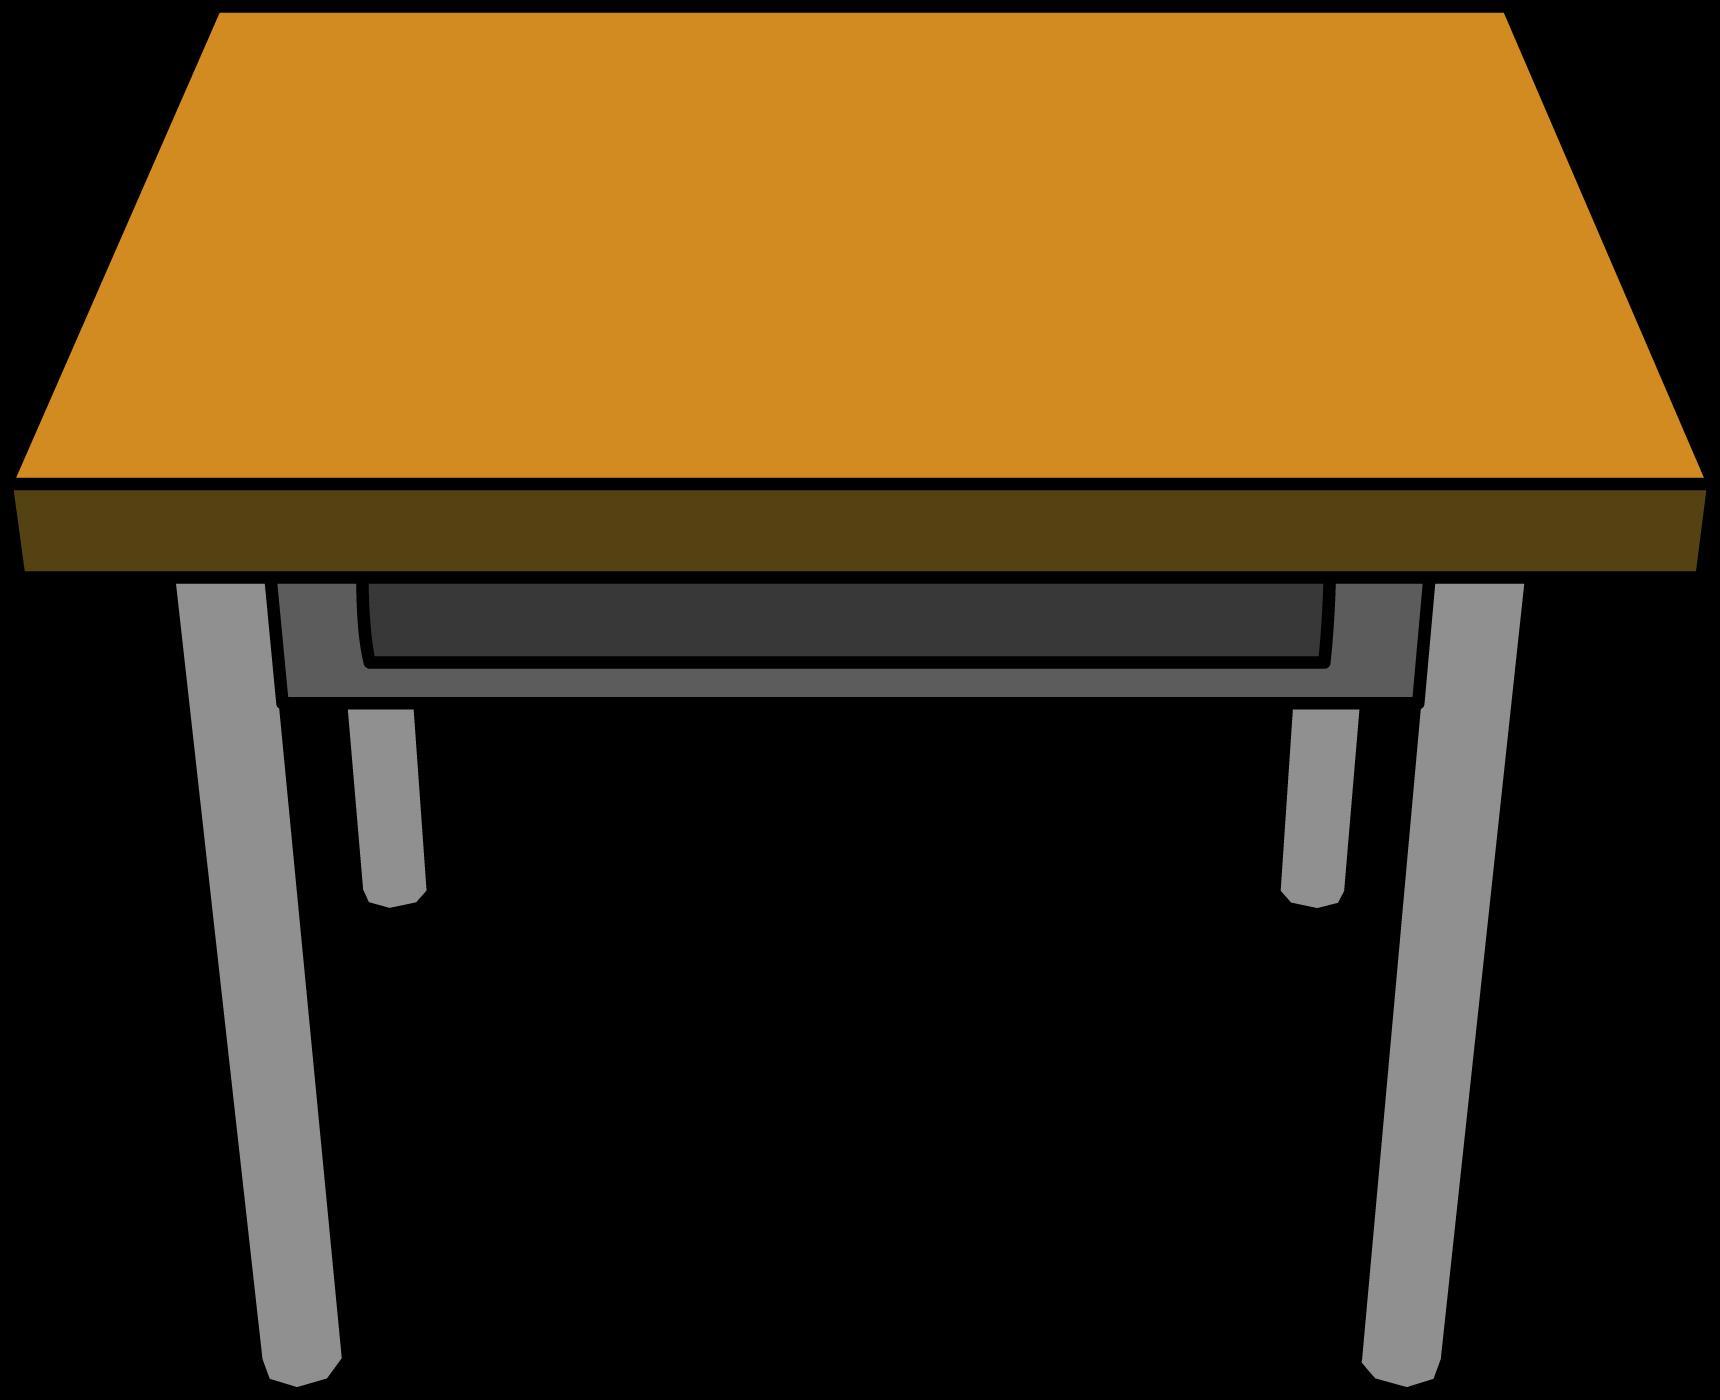 Classroom Desk Clipart-Classroom Desk Clipart-3